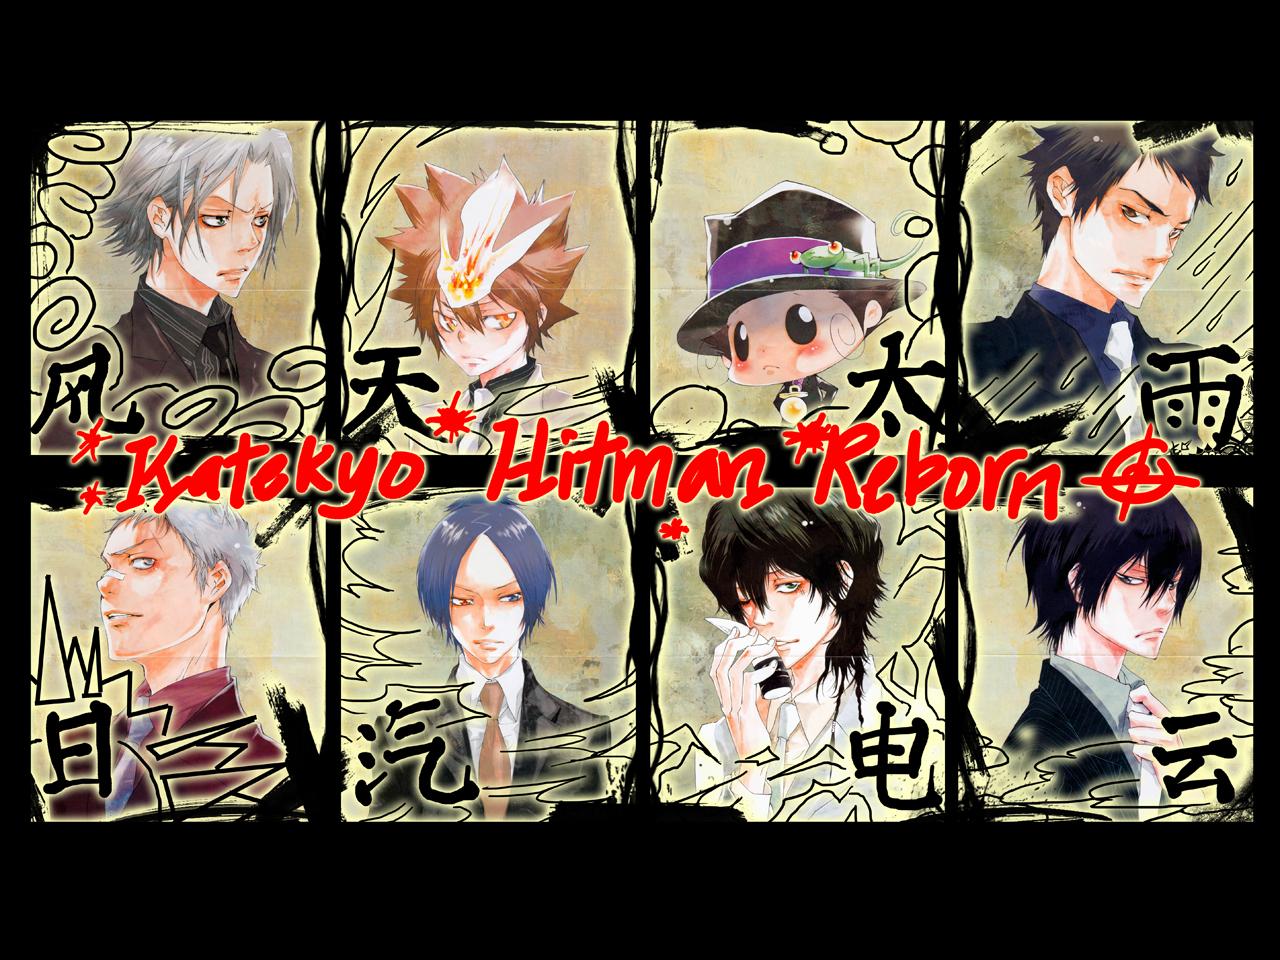 http://fc08.deviantart.com/fs23/f/2007/328/4/6/Katekyo_Hitman_Reborn_WP_ver2_by_piku_chan.jpg